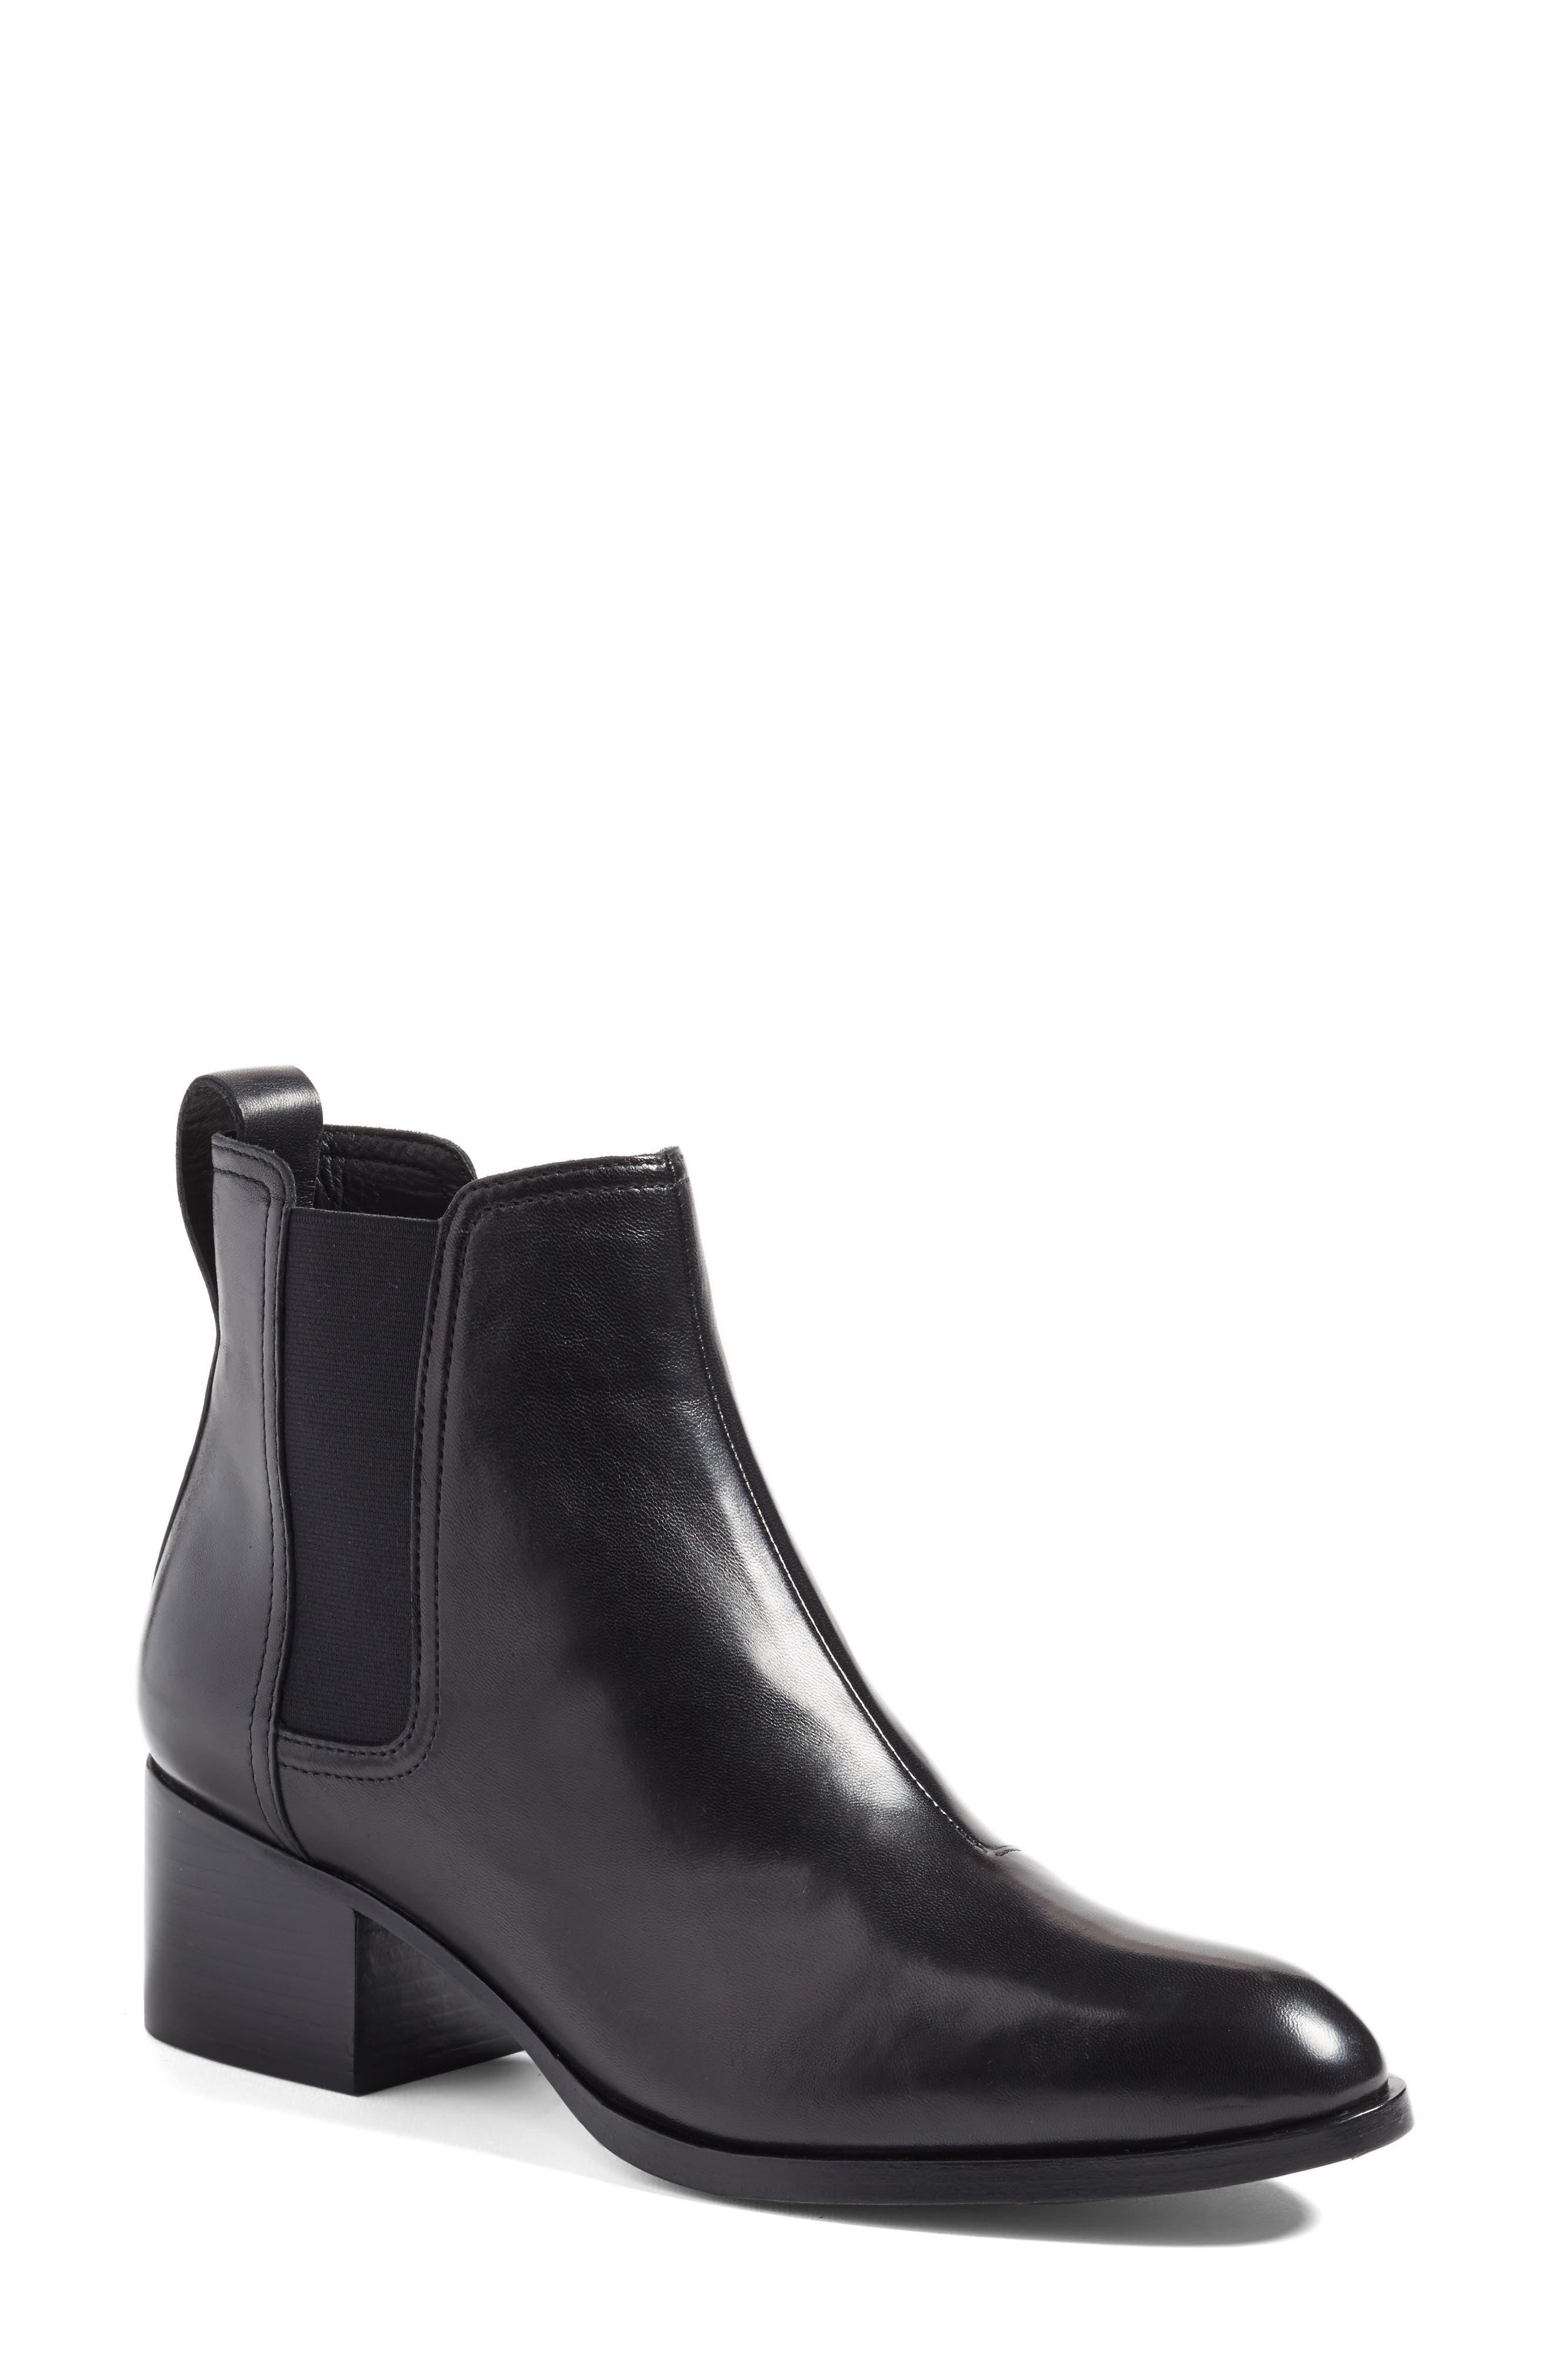 'Walker' Bootie,                         Main,                         color, Black Leather